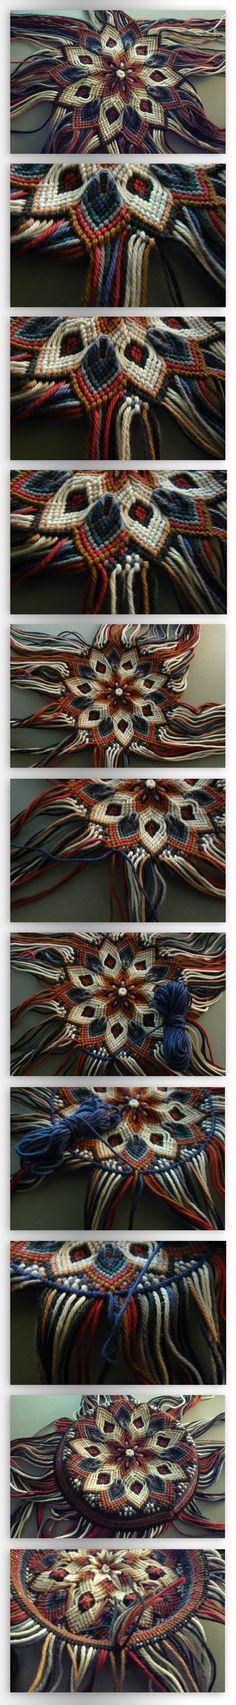 idea, craft, diy art, macrame bag diy, basket weaving, diy project, macrame friendship bracelets, pouch tutorial part, kid